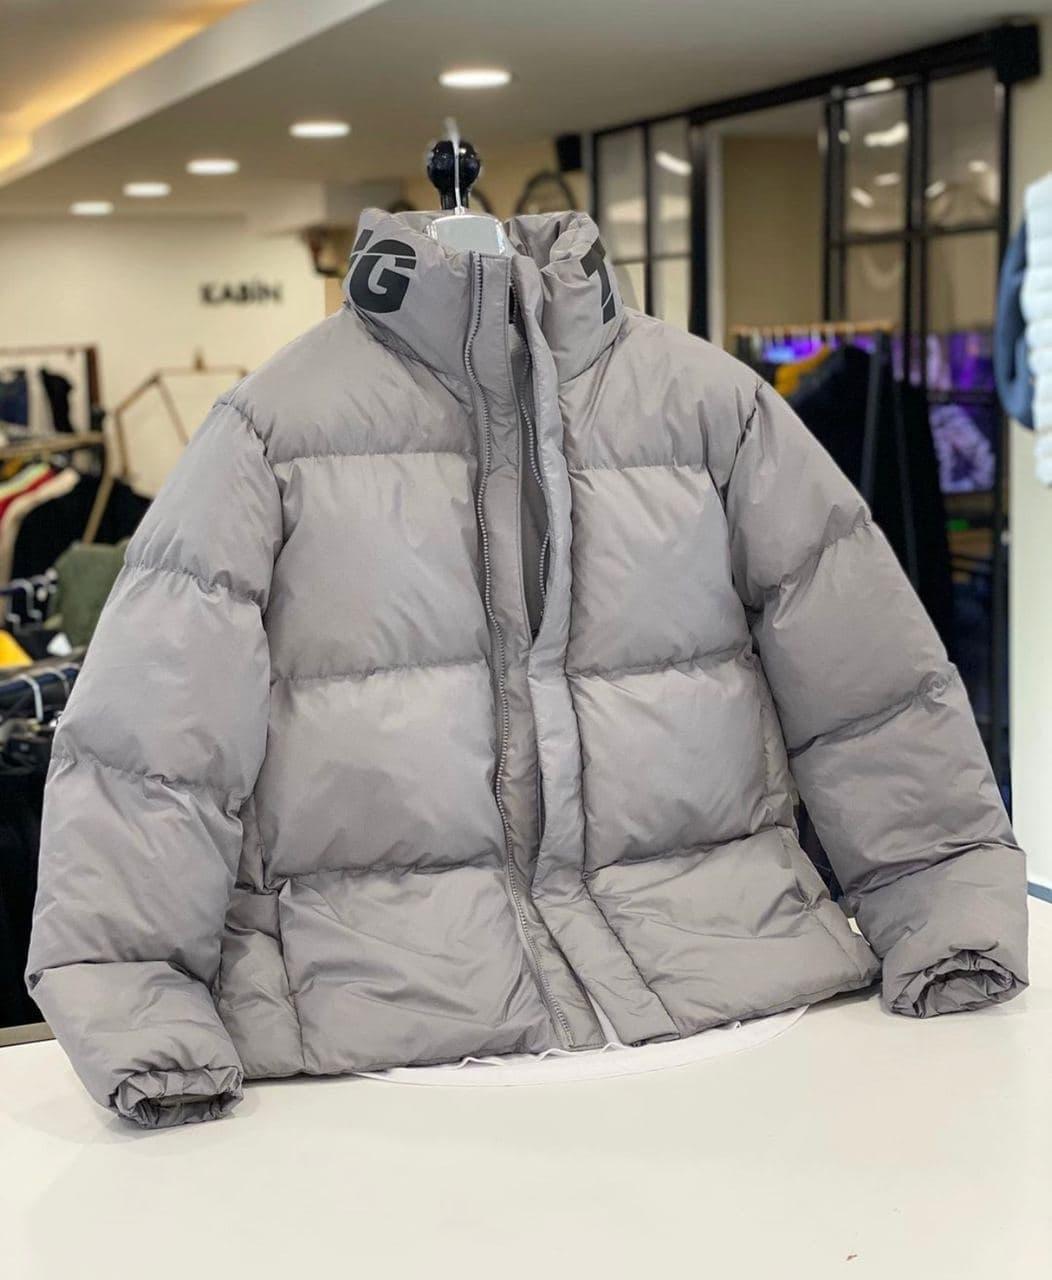 Пуховик - Мужской пуховик серый без капюшона / чоловіча куртка без капюшону